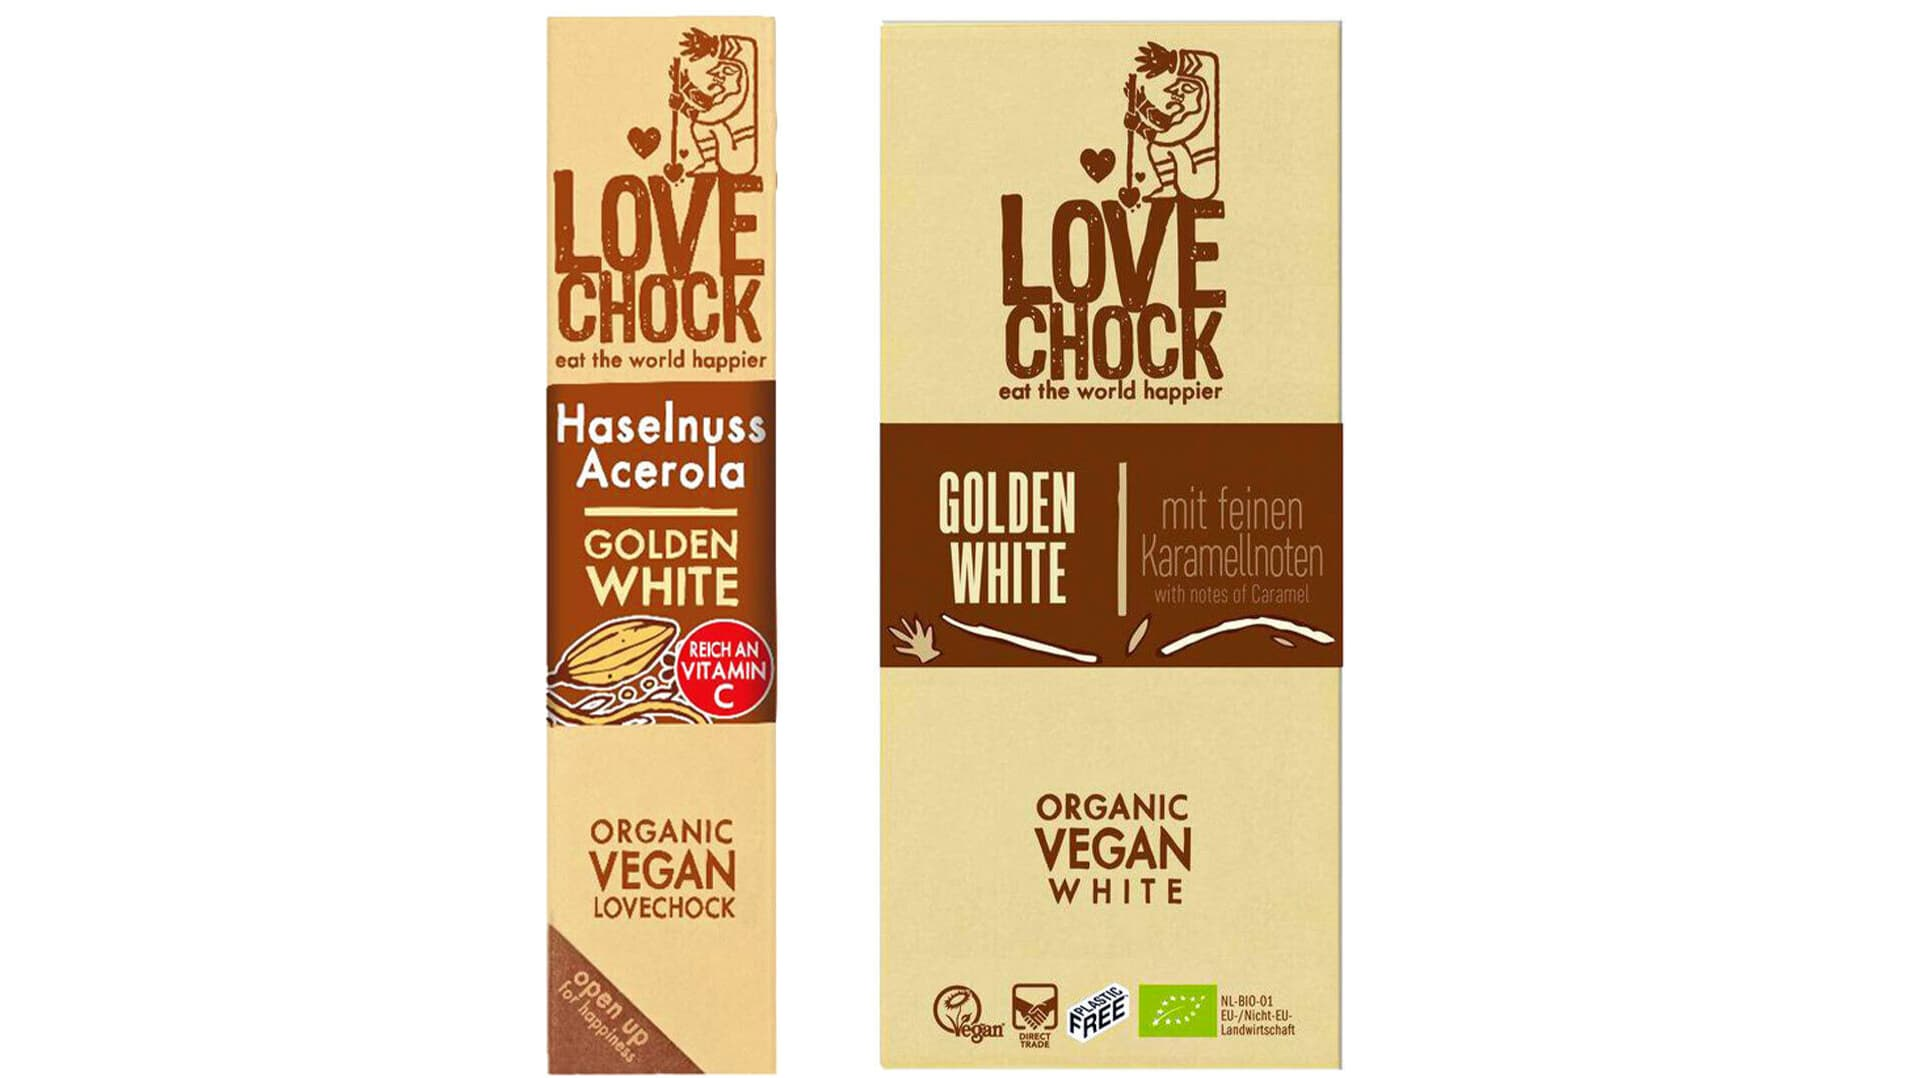 Love Chock Schokolade